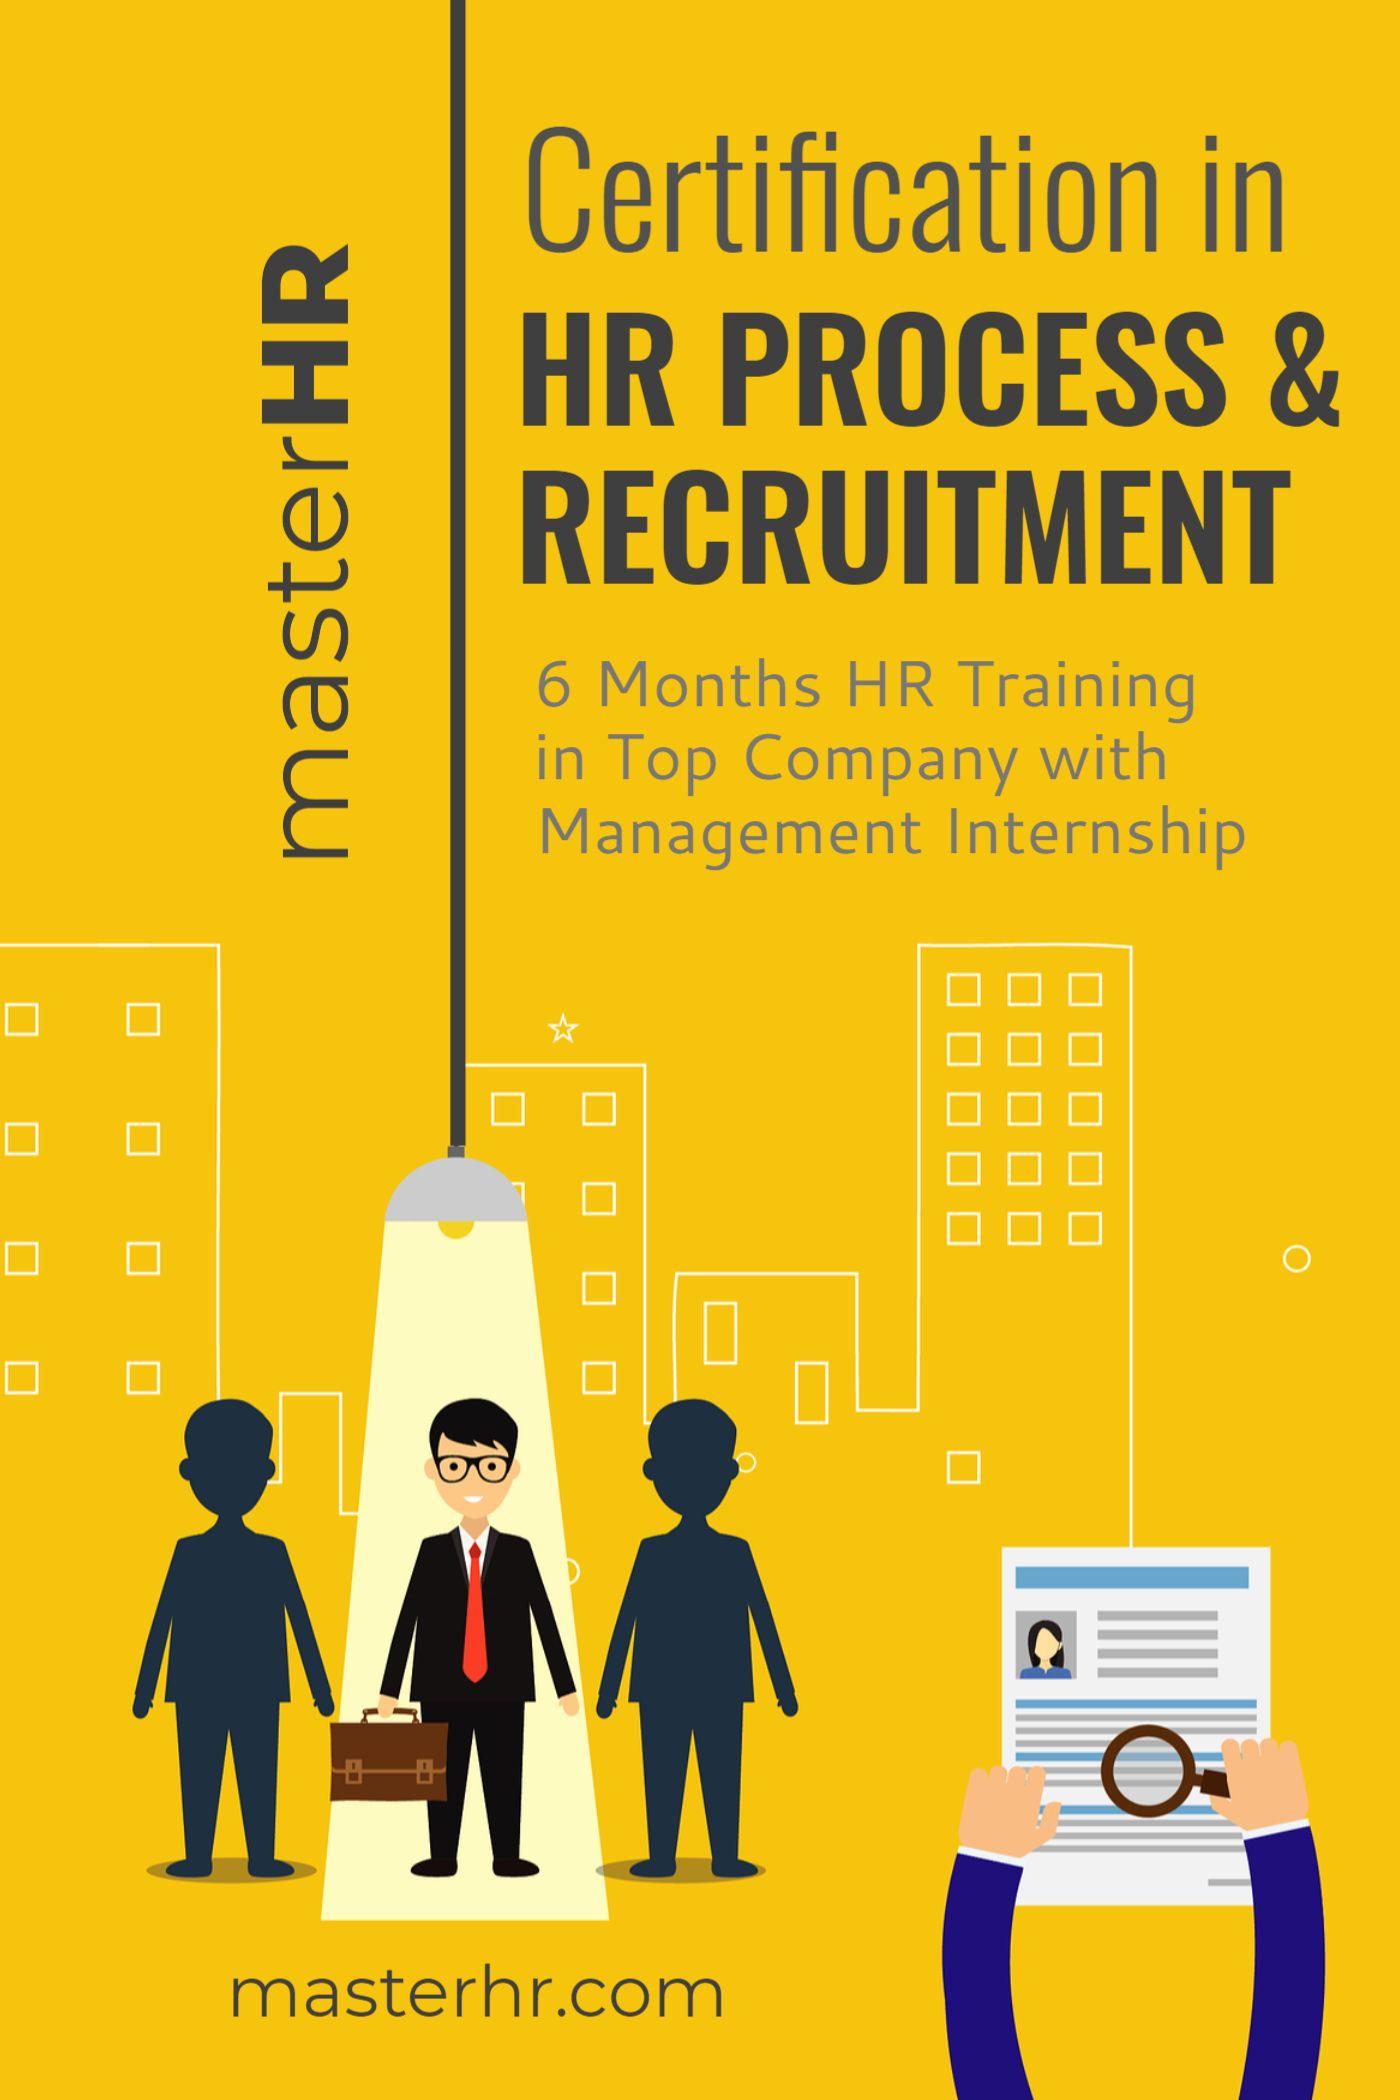 HR Process eBook Cover Template